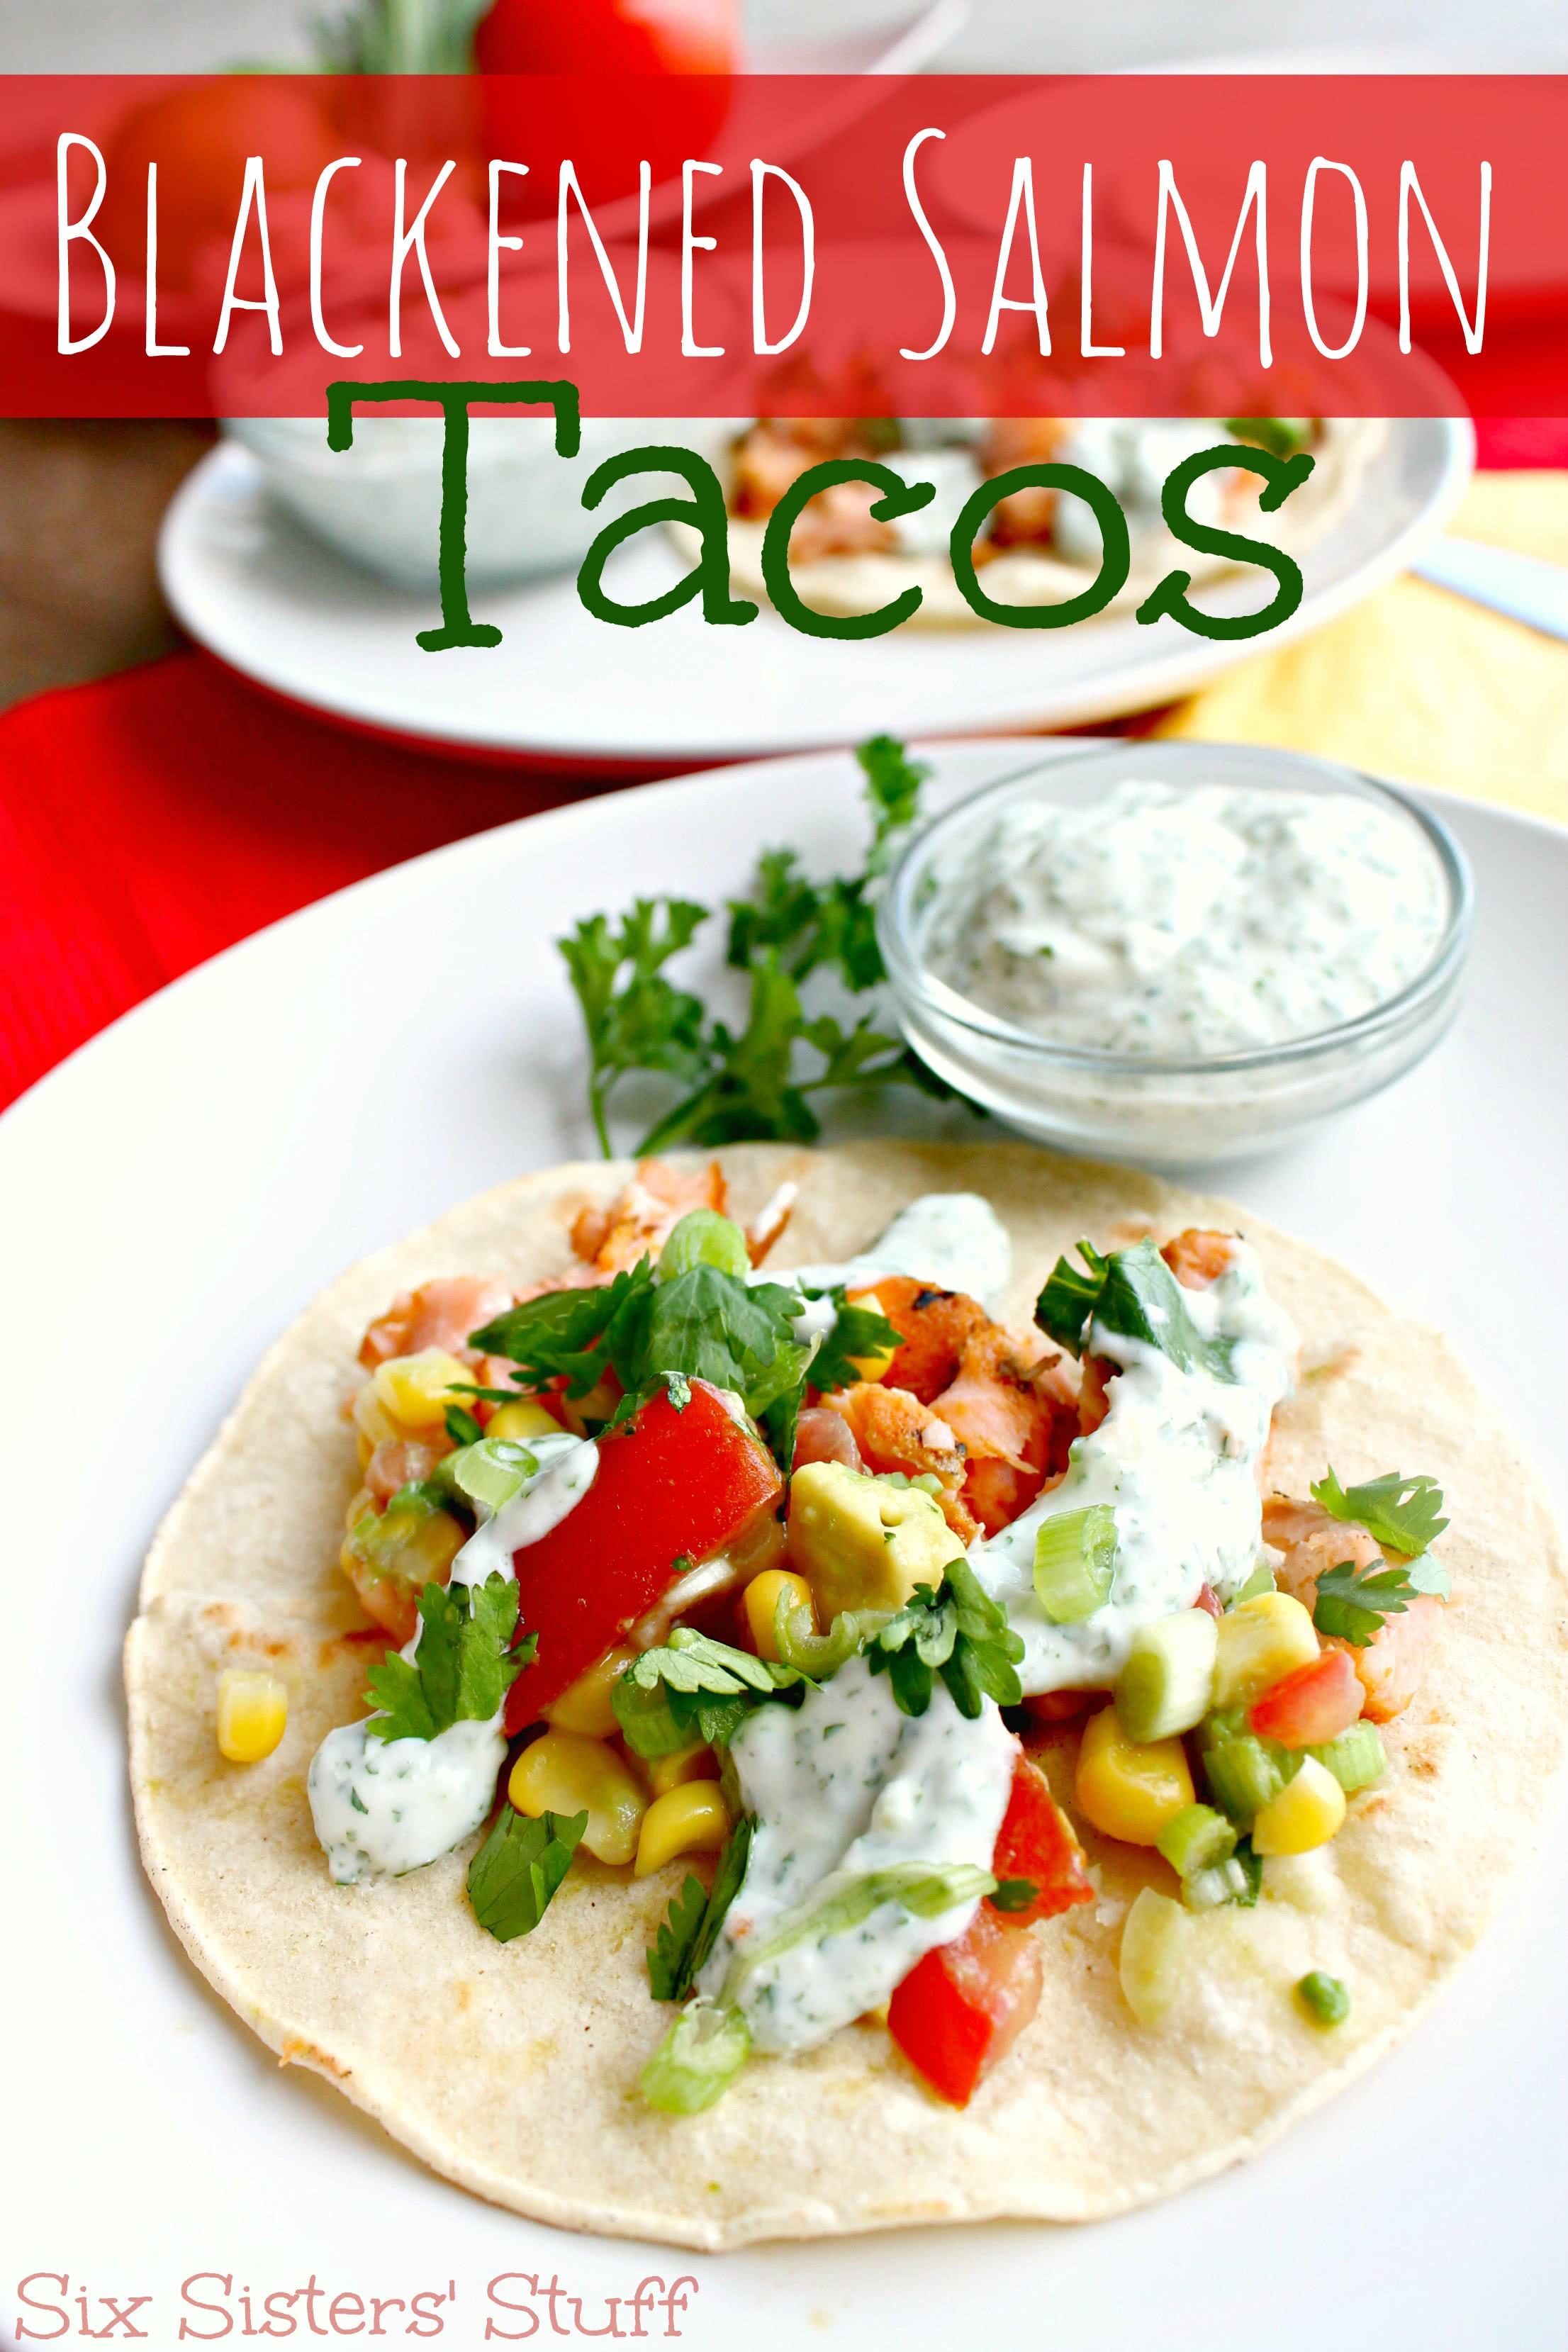 Delicious Blackened Salmon Tacos